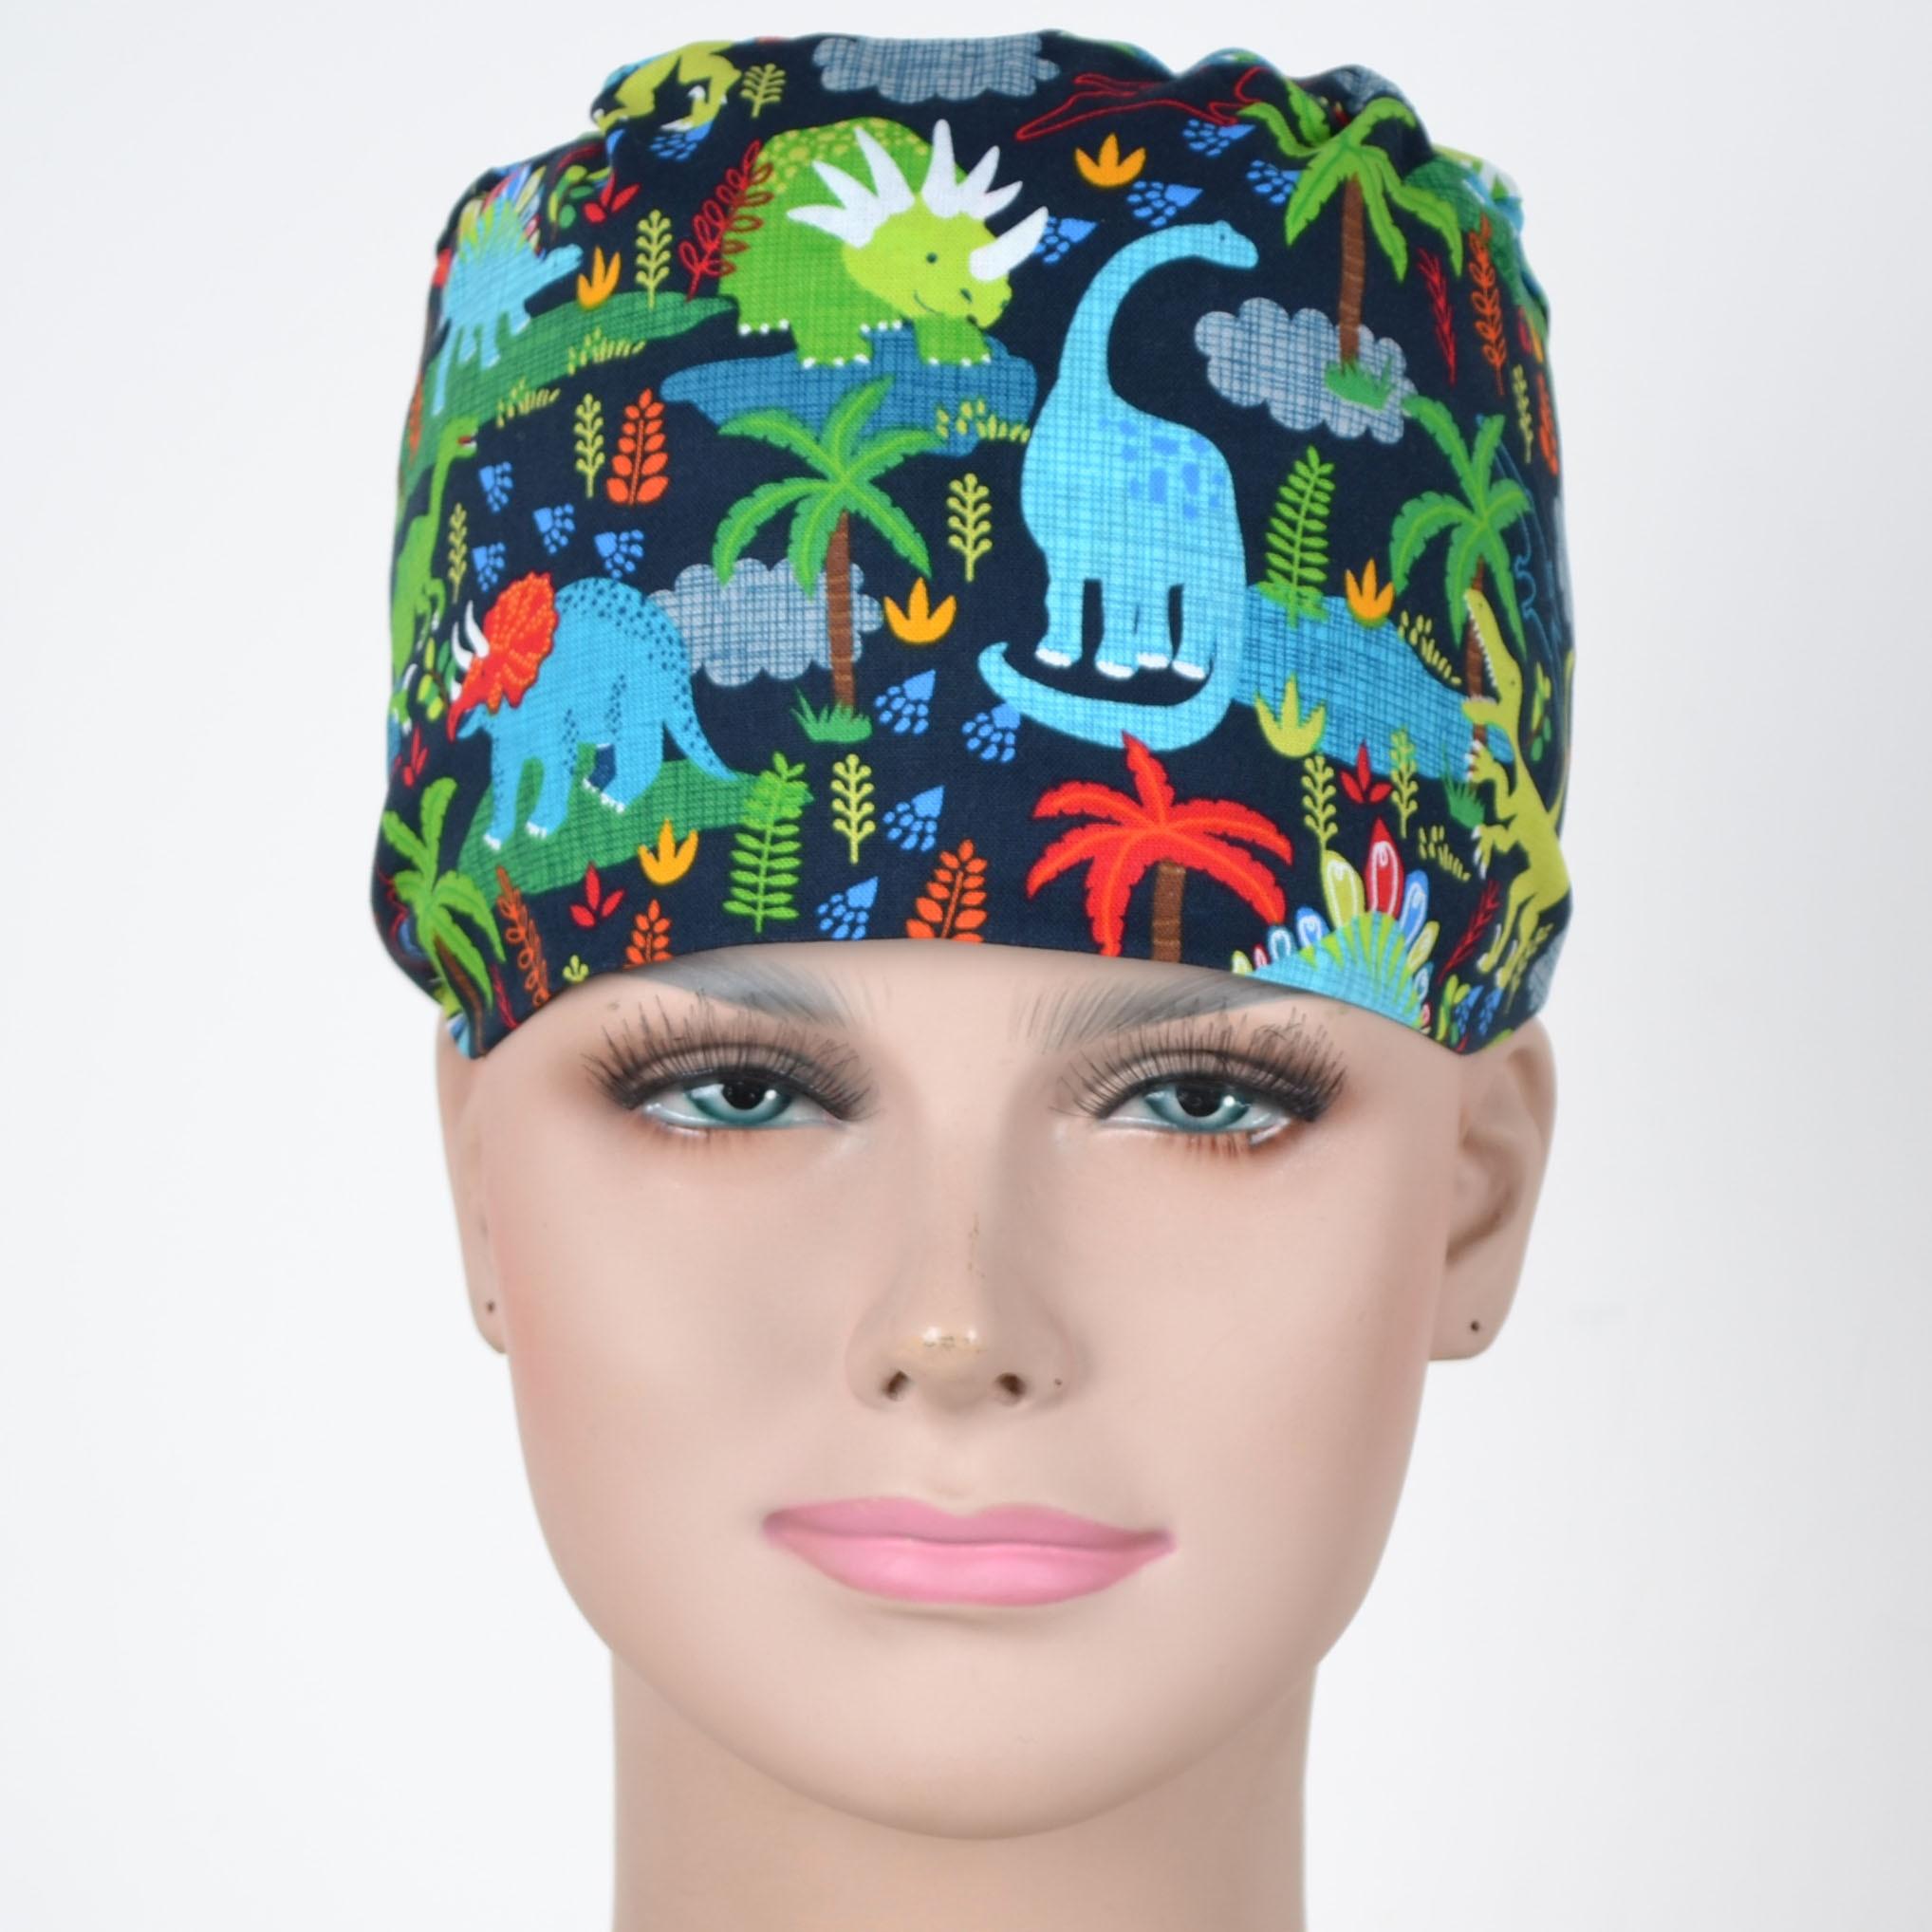 Hennar Unisex Cotton Scrub Caps Masks Hospital Medical Hats Print Adjustable In Dark Blue With Dinosaur Unisex Surgical Caps